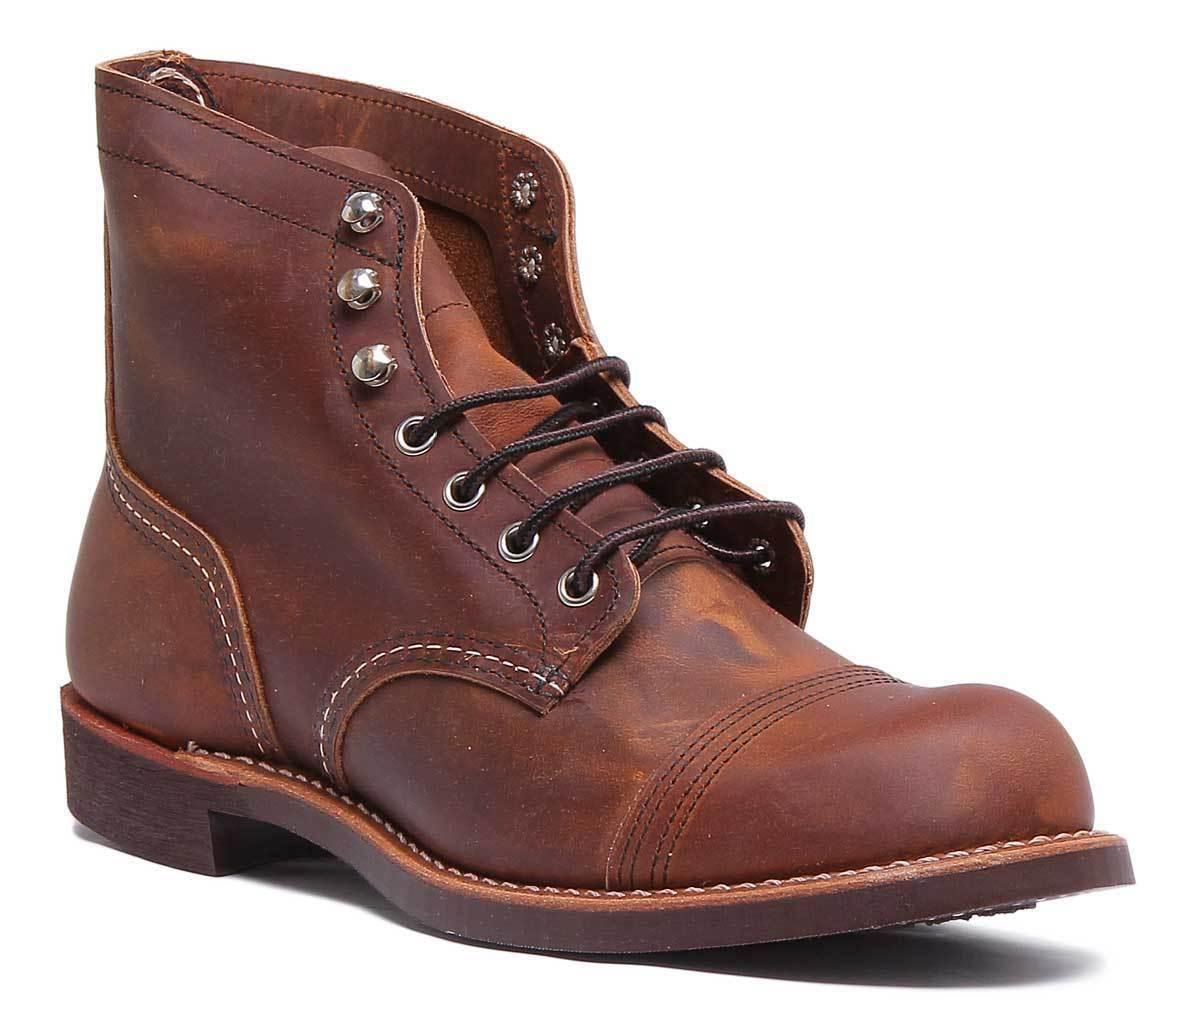 rot Wing 8085 Iron Ranger Mens Leather Matt Ankle Stiefel In Copper Größe UK 6 - 12